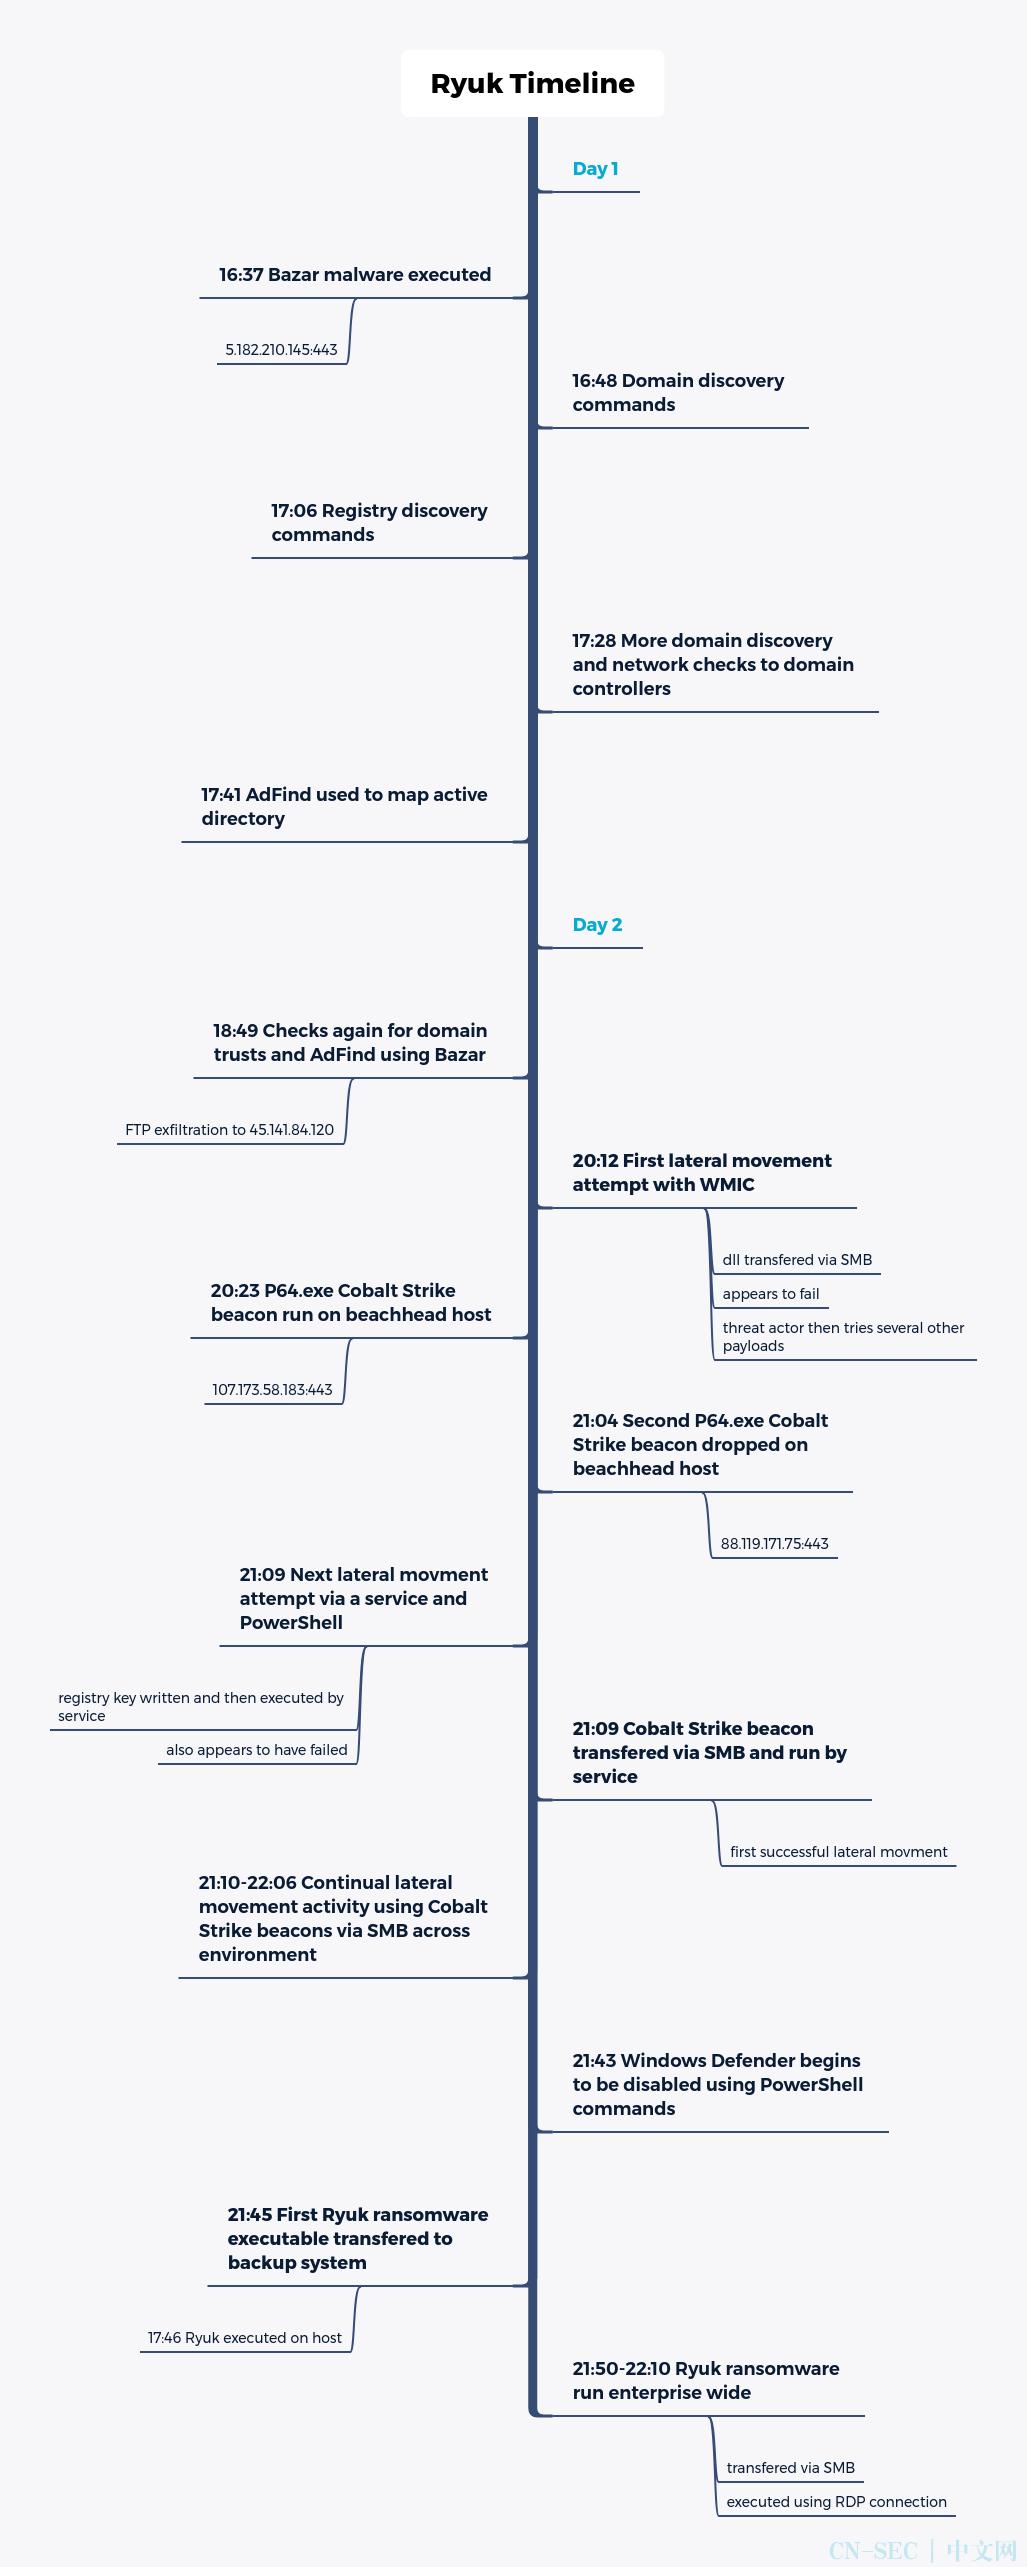 Ryuk 勒索事件分析